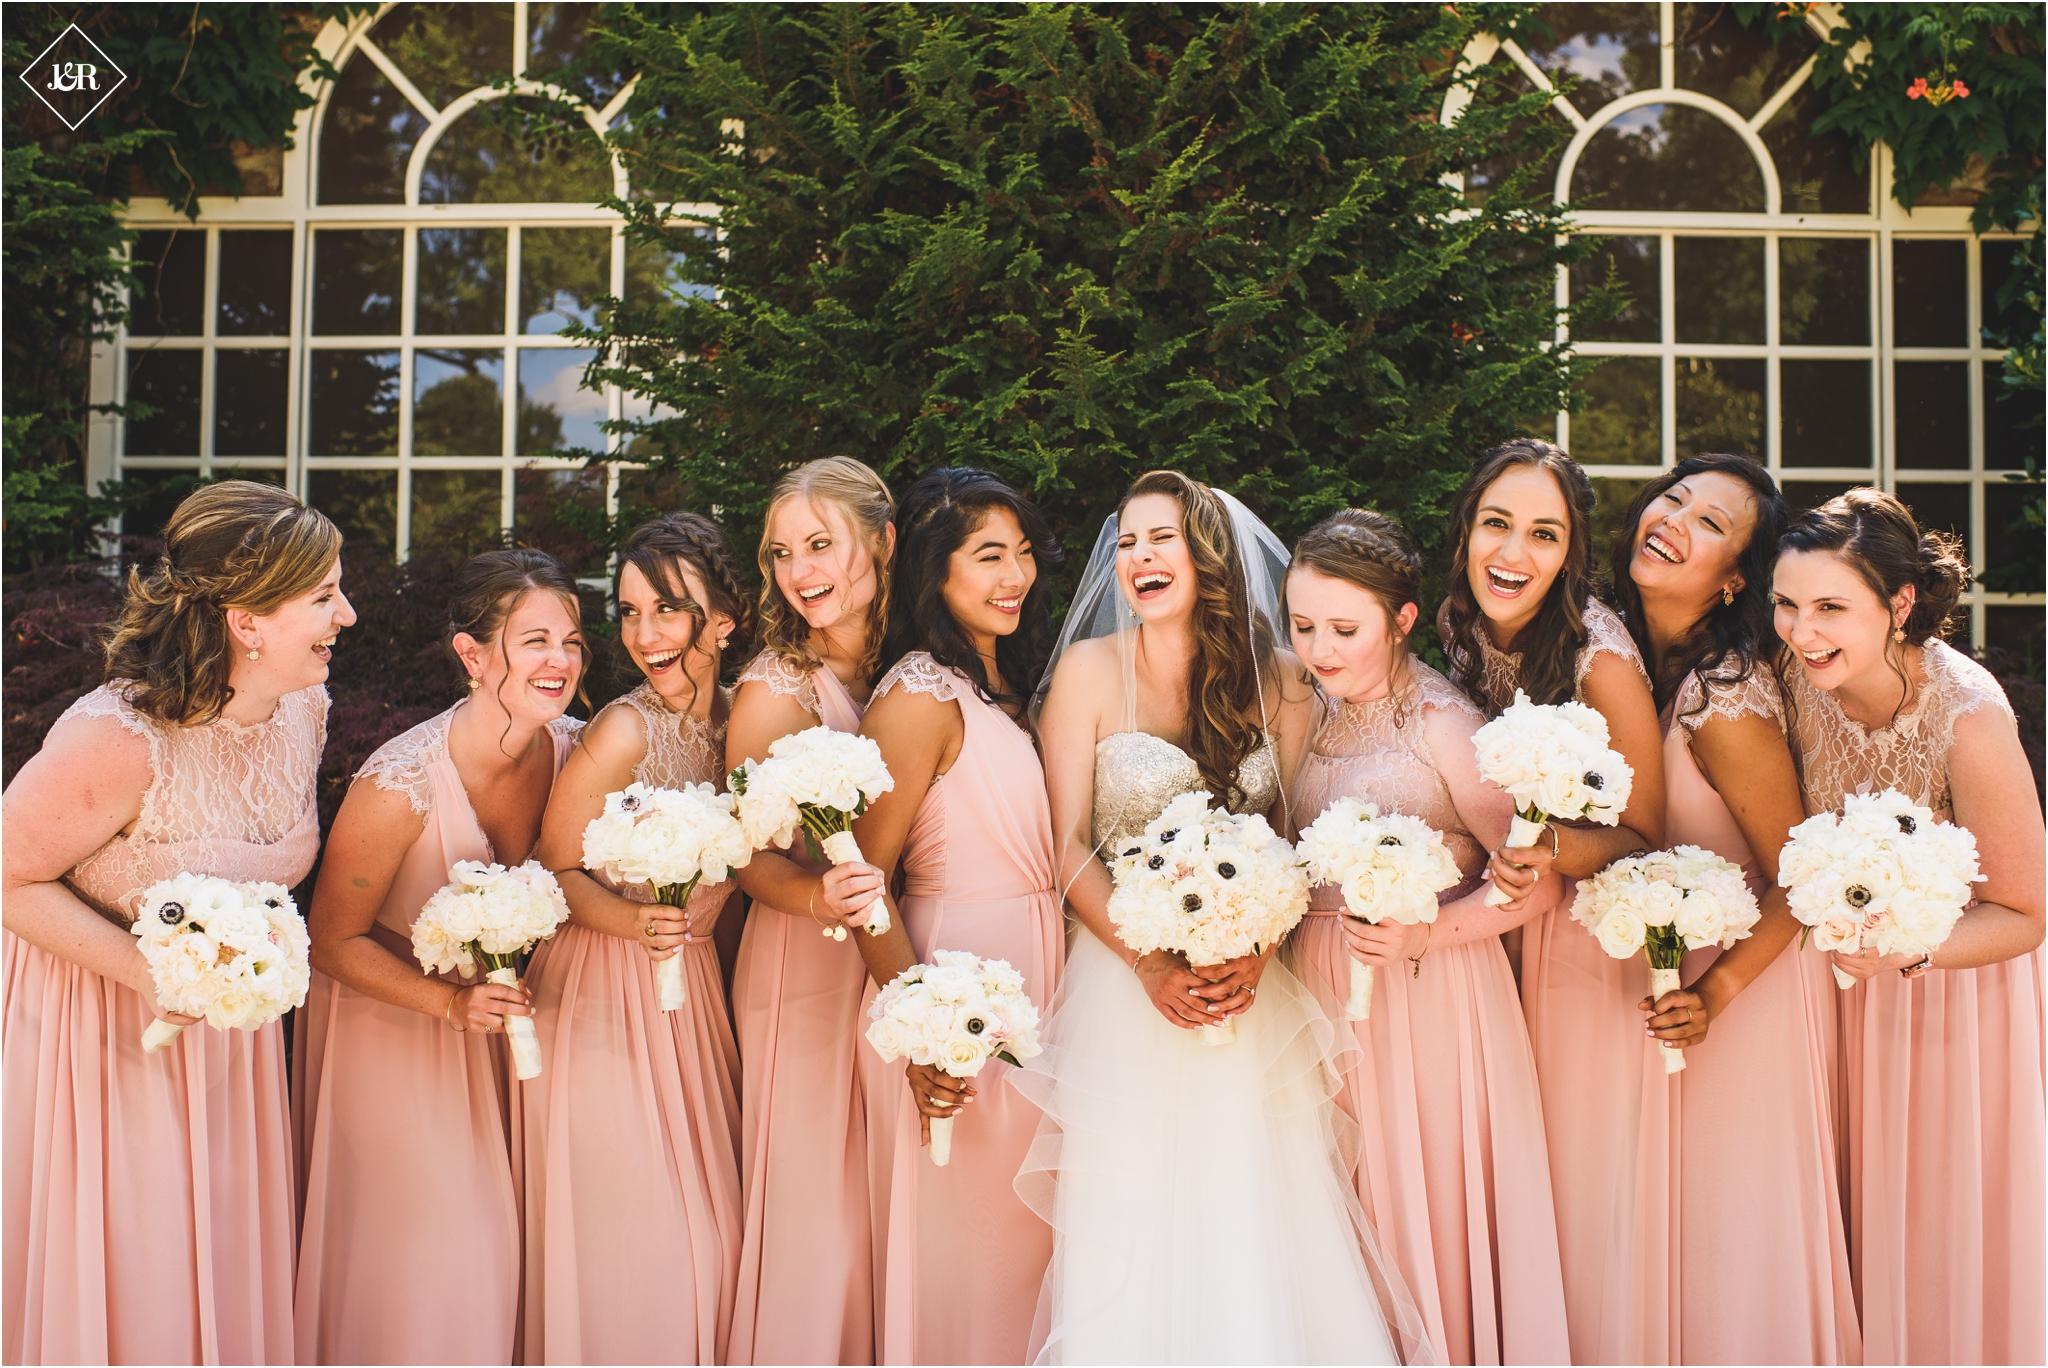 Crystal-Plaza-Wedding-Photographer_0044.jpg